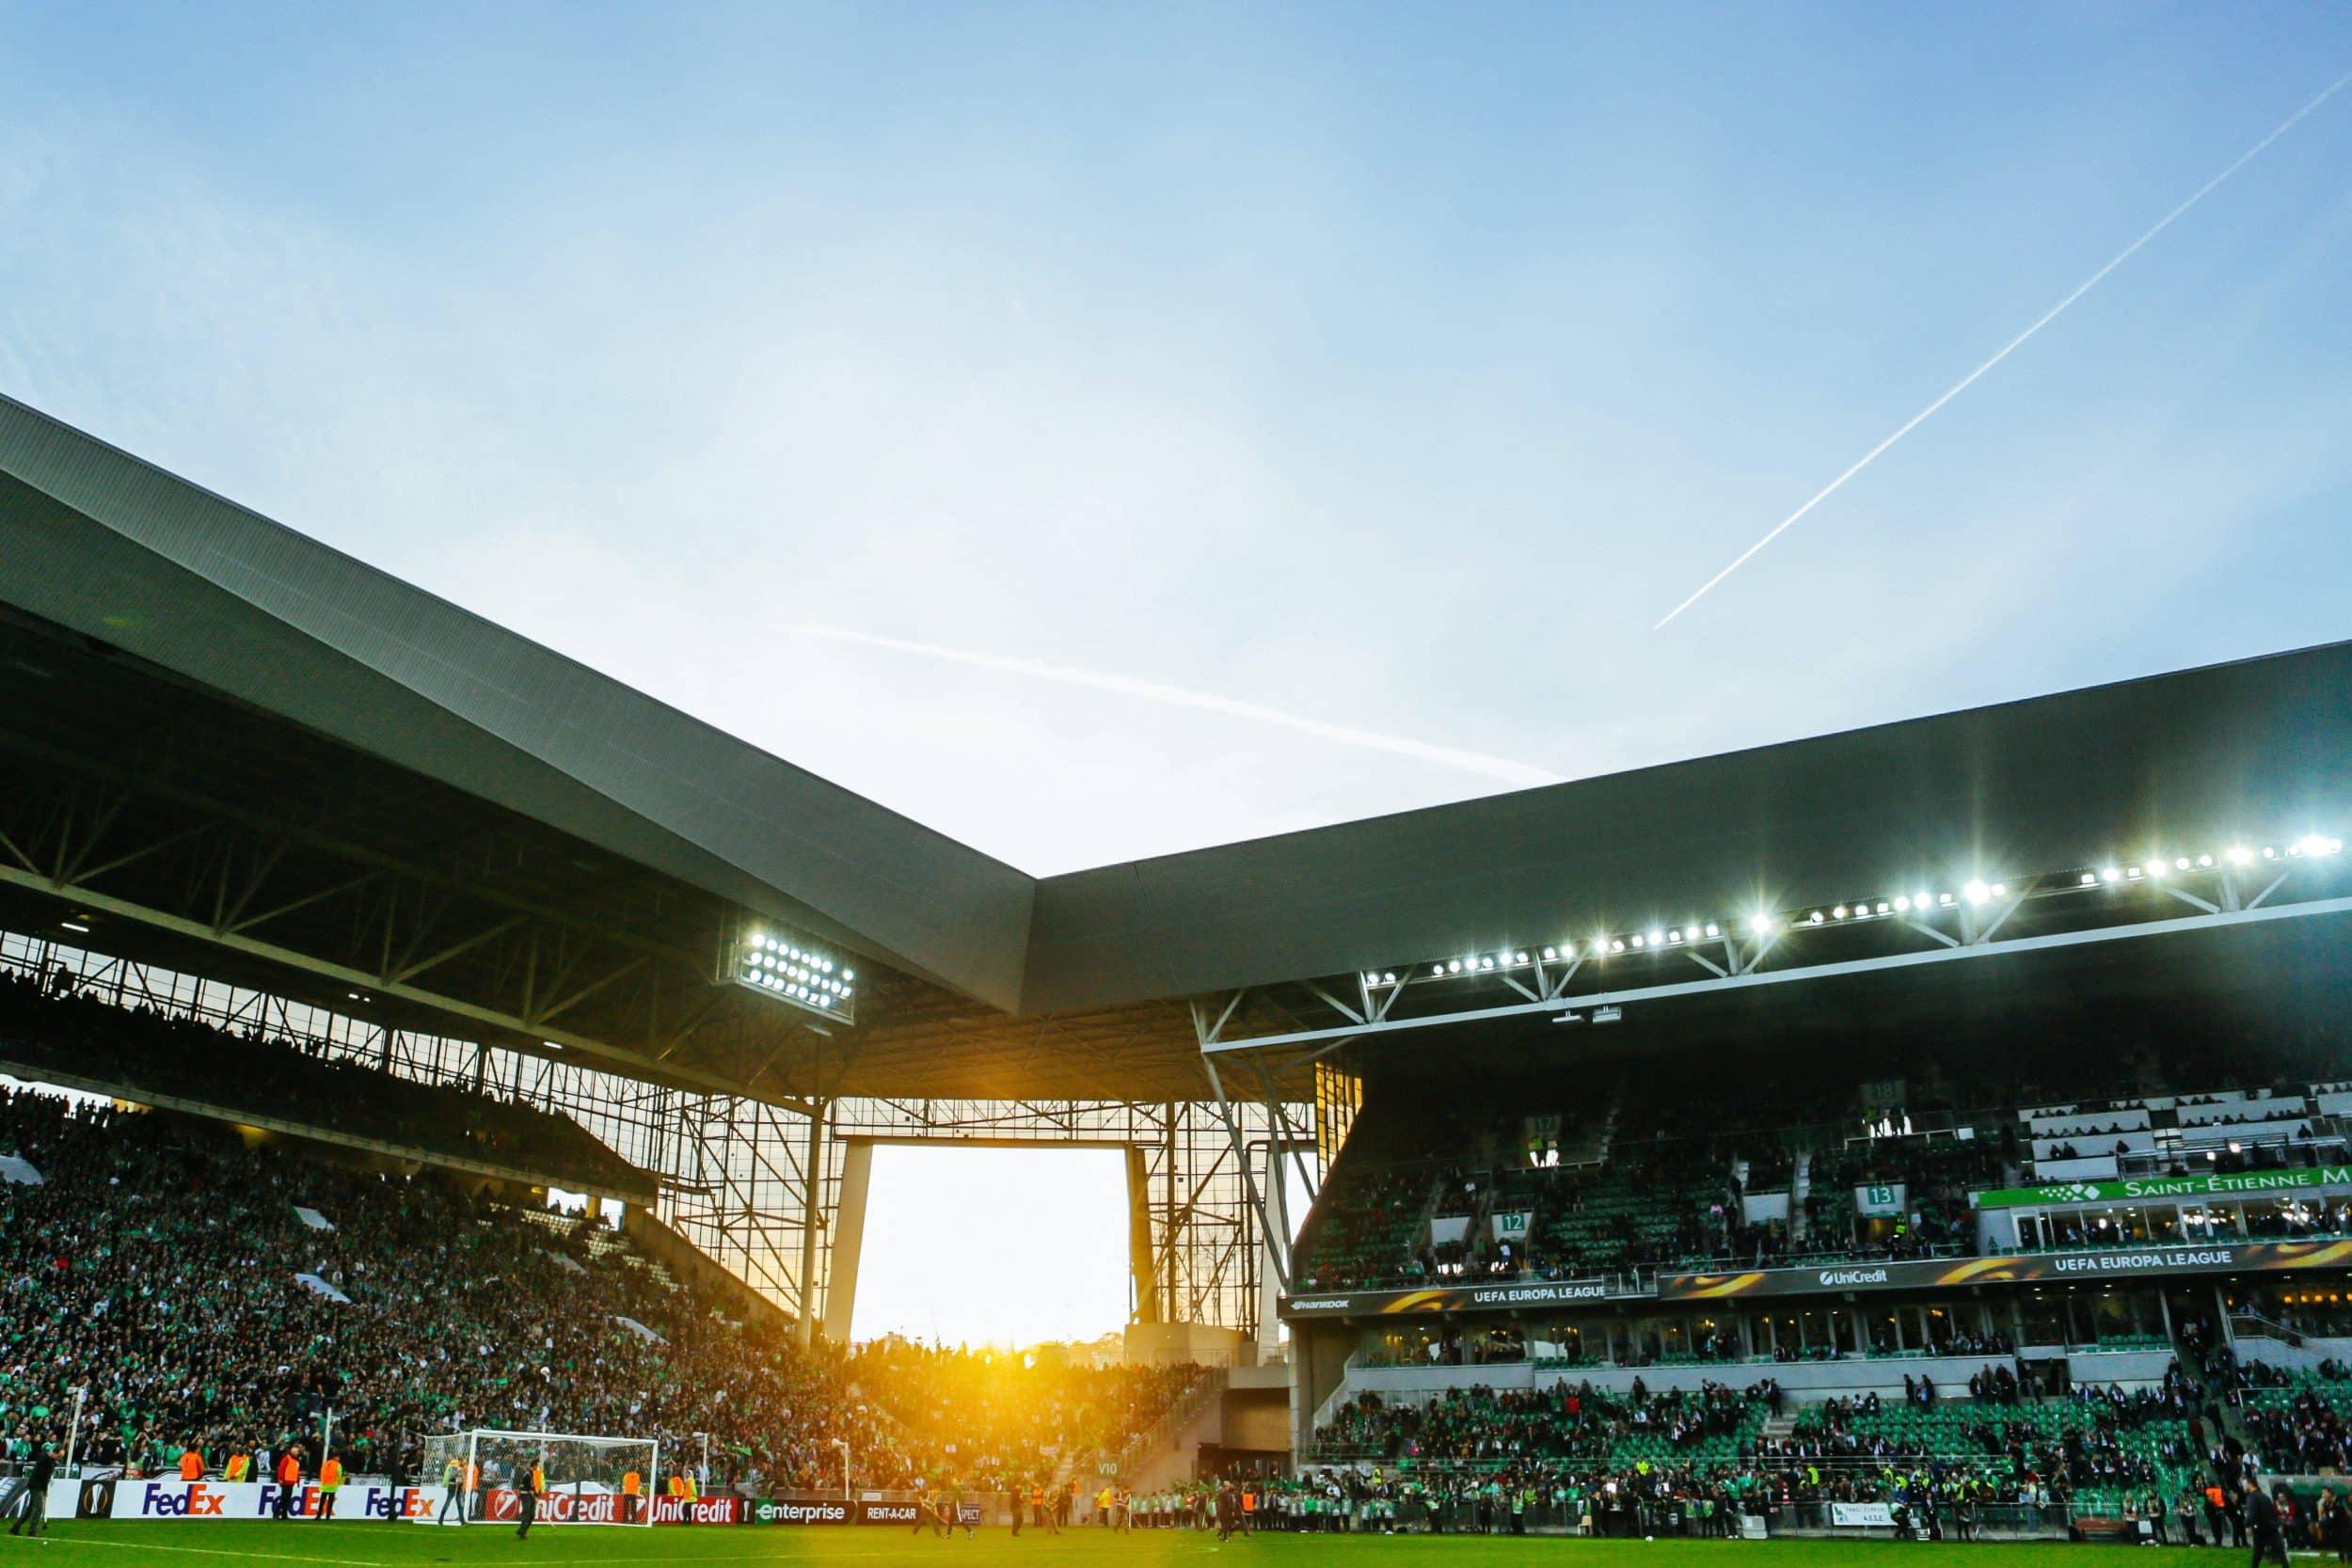 au-stade-geoffroy-guichard-asse-manchester-united-europa-league-8-min (1)